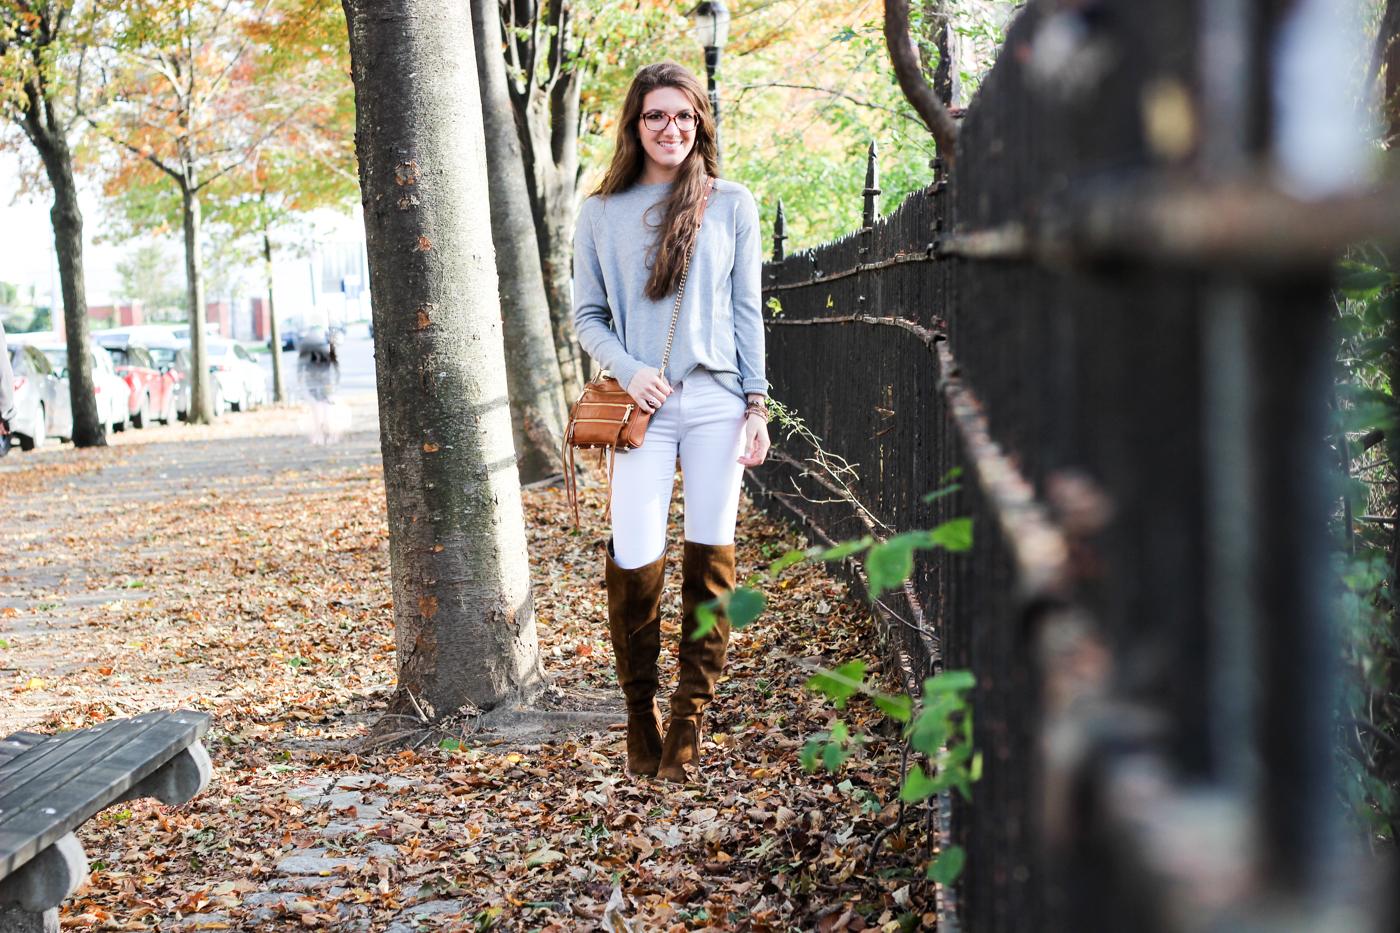 Fall Fashion | Distressed White Denim + OTK Boots